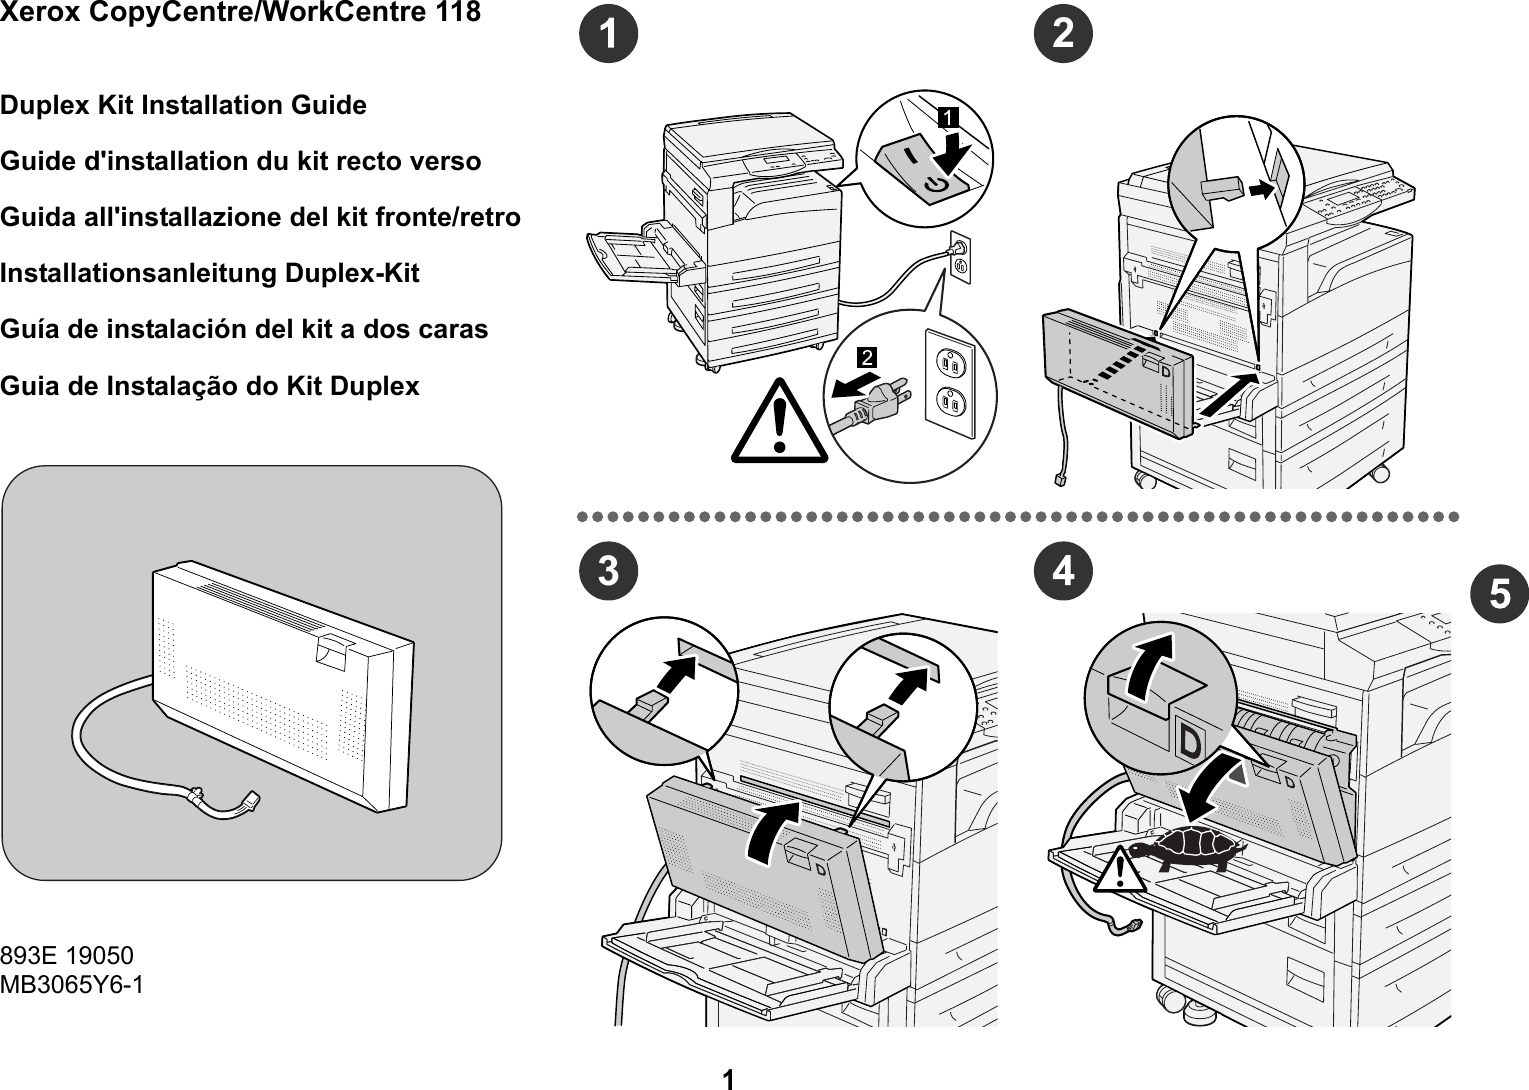 Xerox Copycentre C118 инструкция